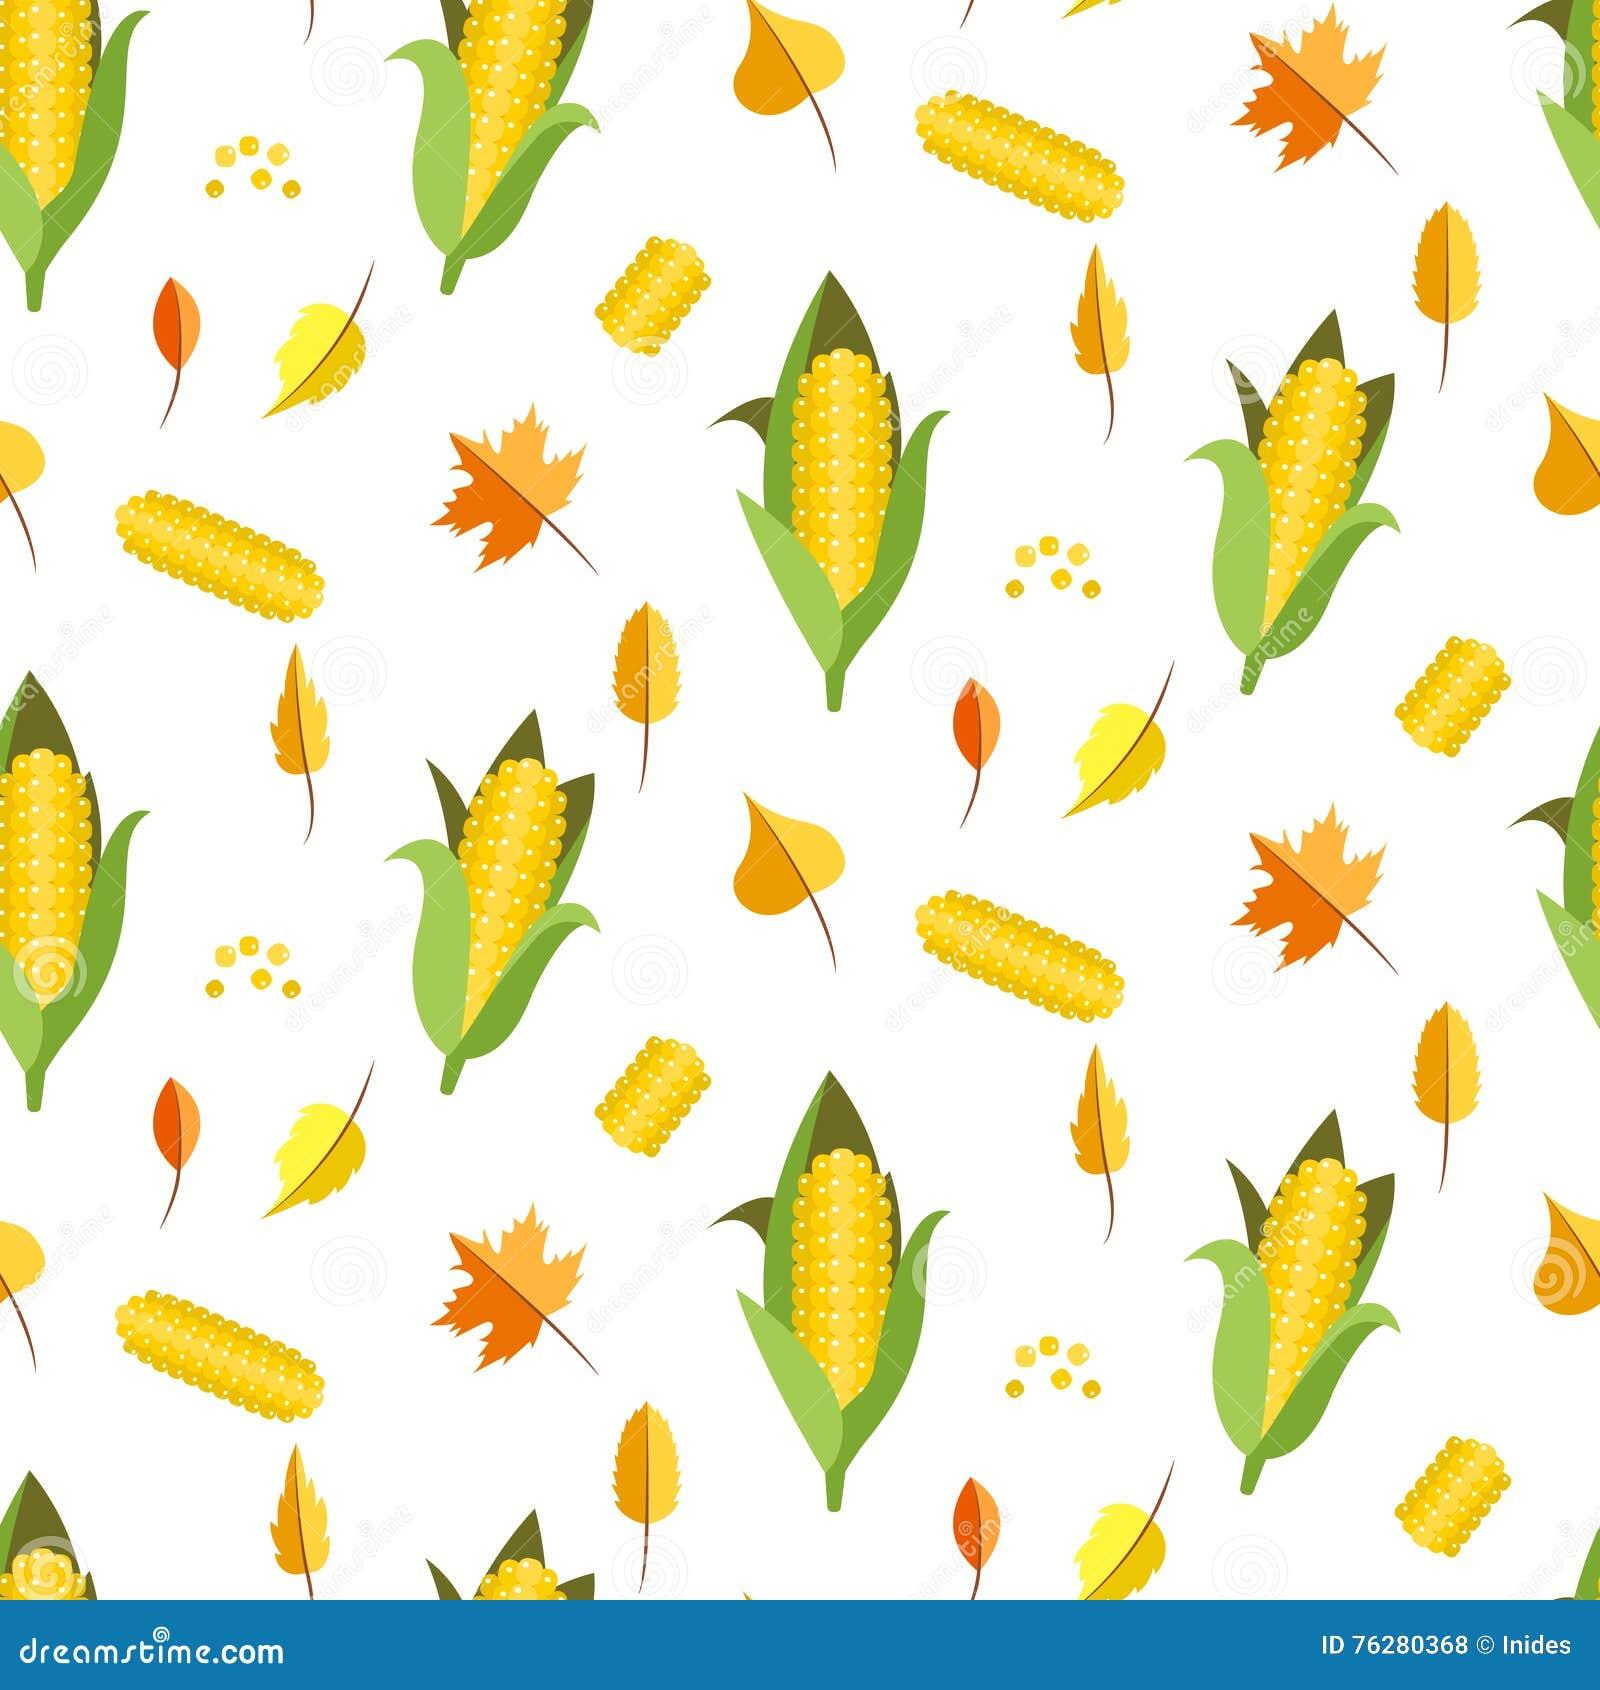 corn seamless pattern vector illustration maize ear or cob stock